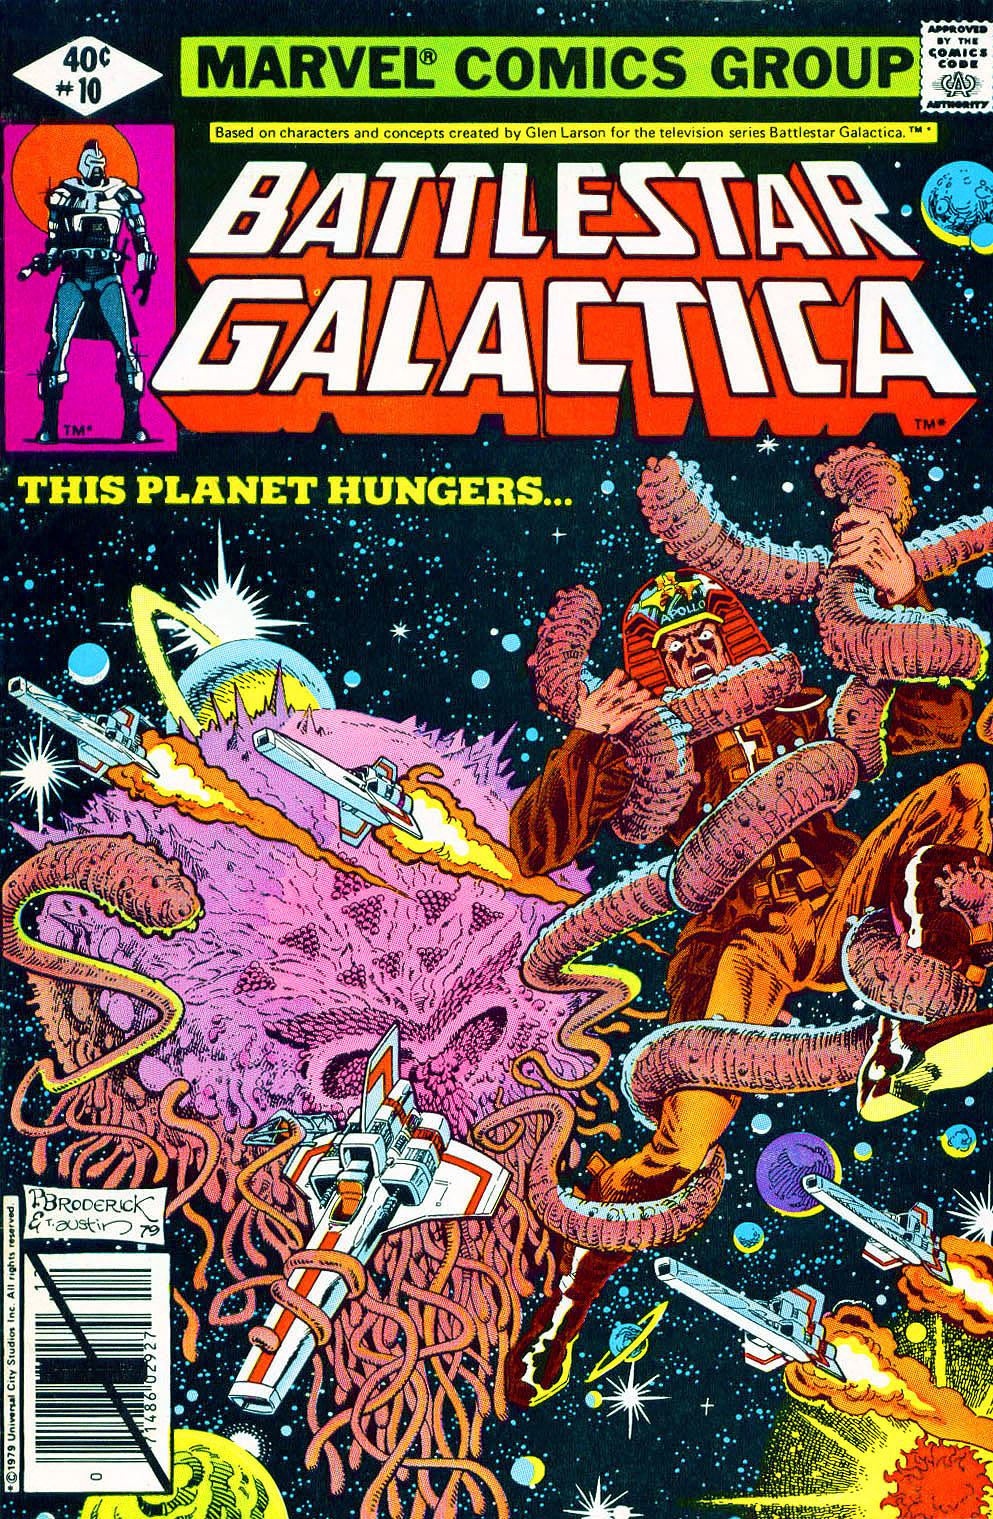 Battlestar Galactica 10 Page 1